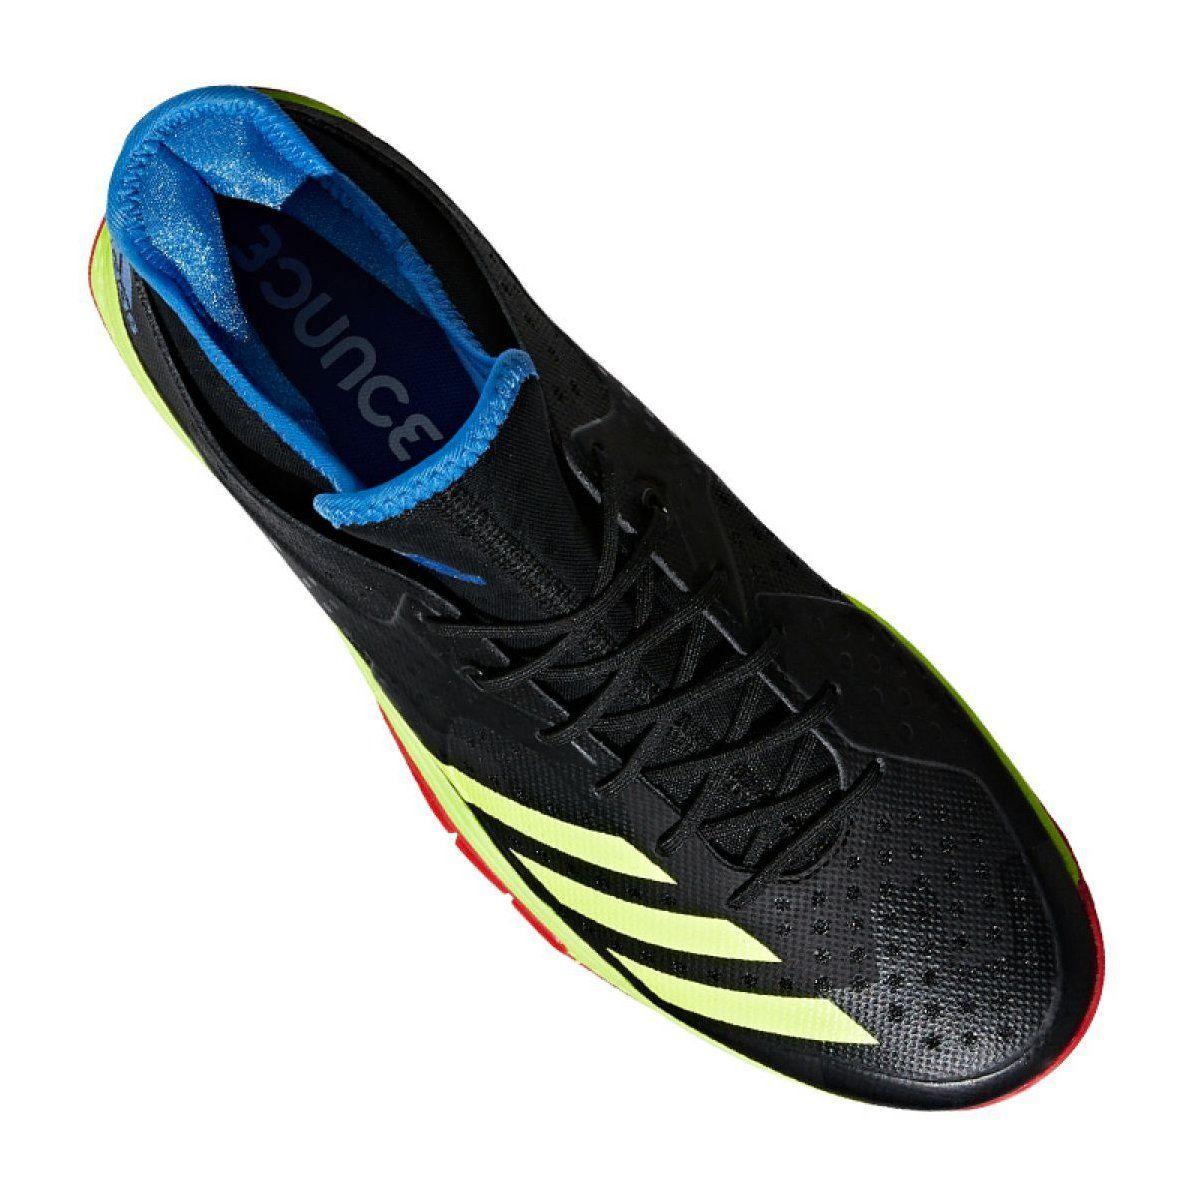 Adidas Counterblast Bounce M BD7408 handball shoes black